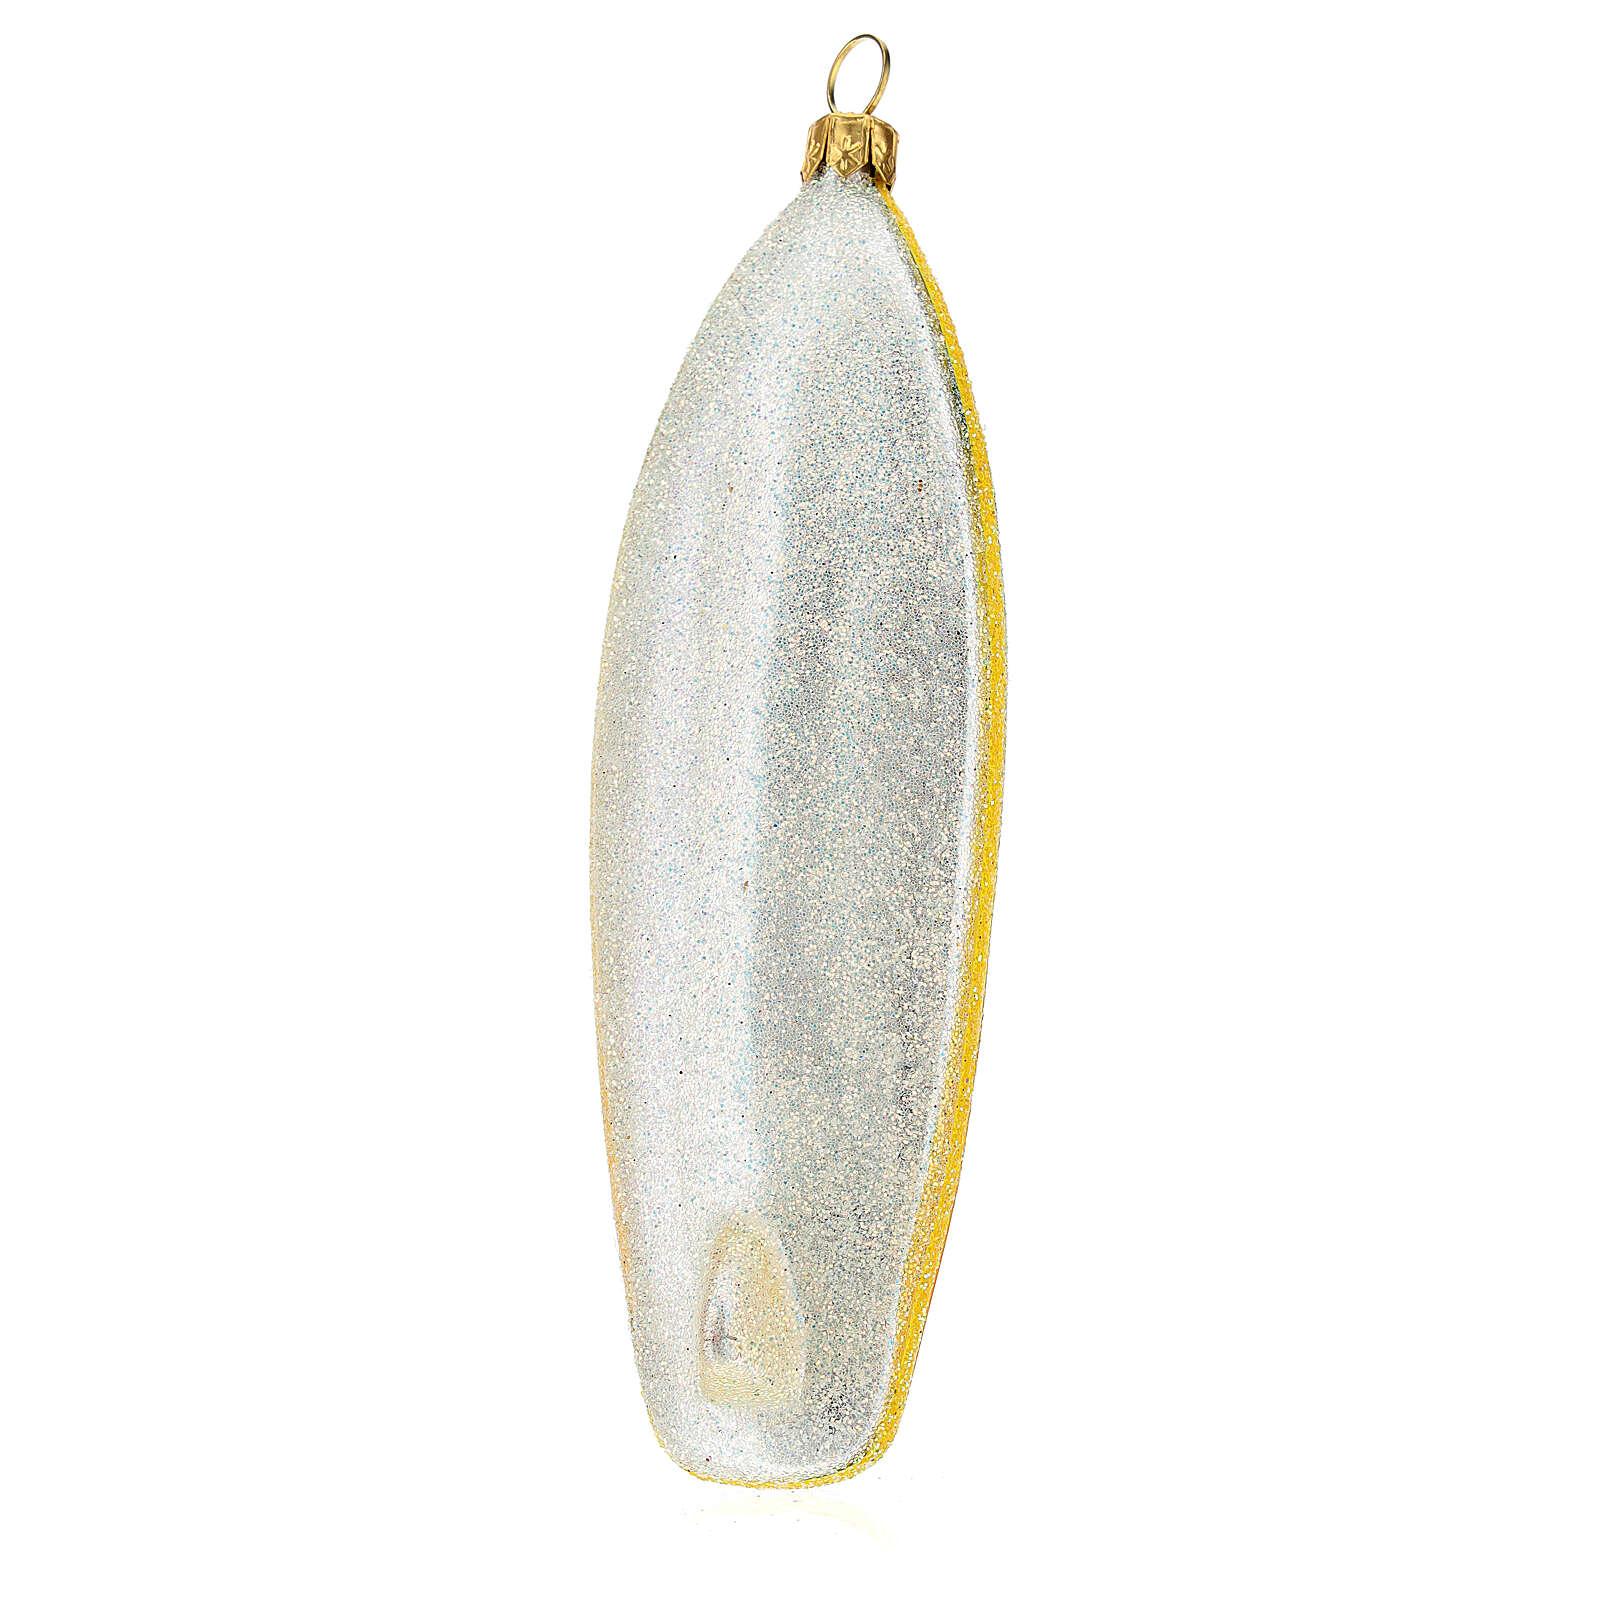 Prancha de surf enfeite para árvore de Natal vidro soprado 4